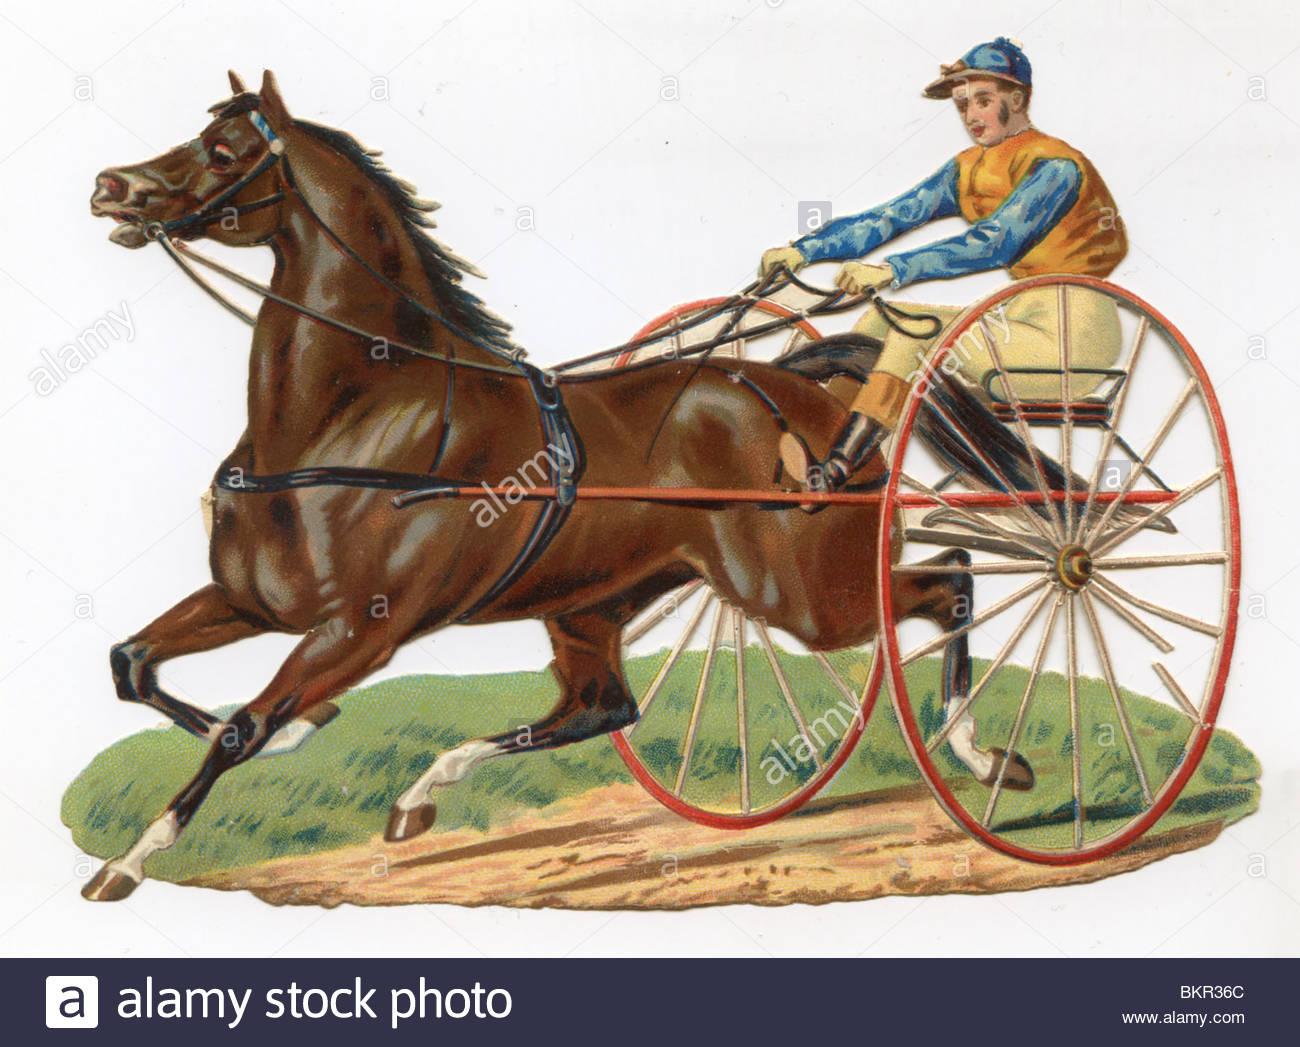 jockey-racing-a-horse-drawn-carriage-victorian-era-BKR36C.jpg